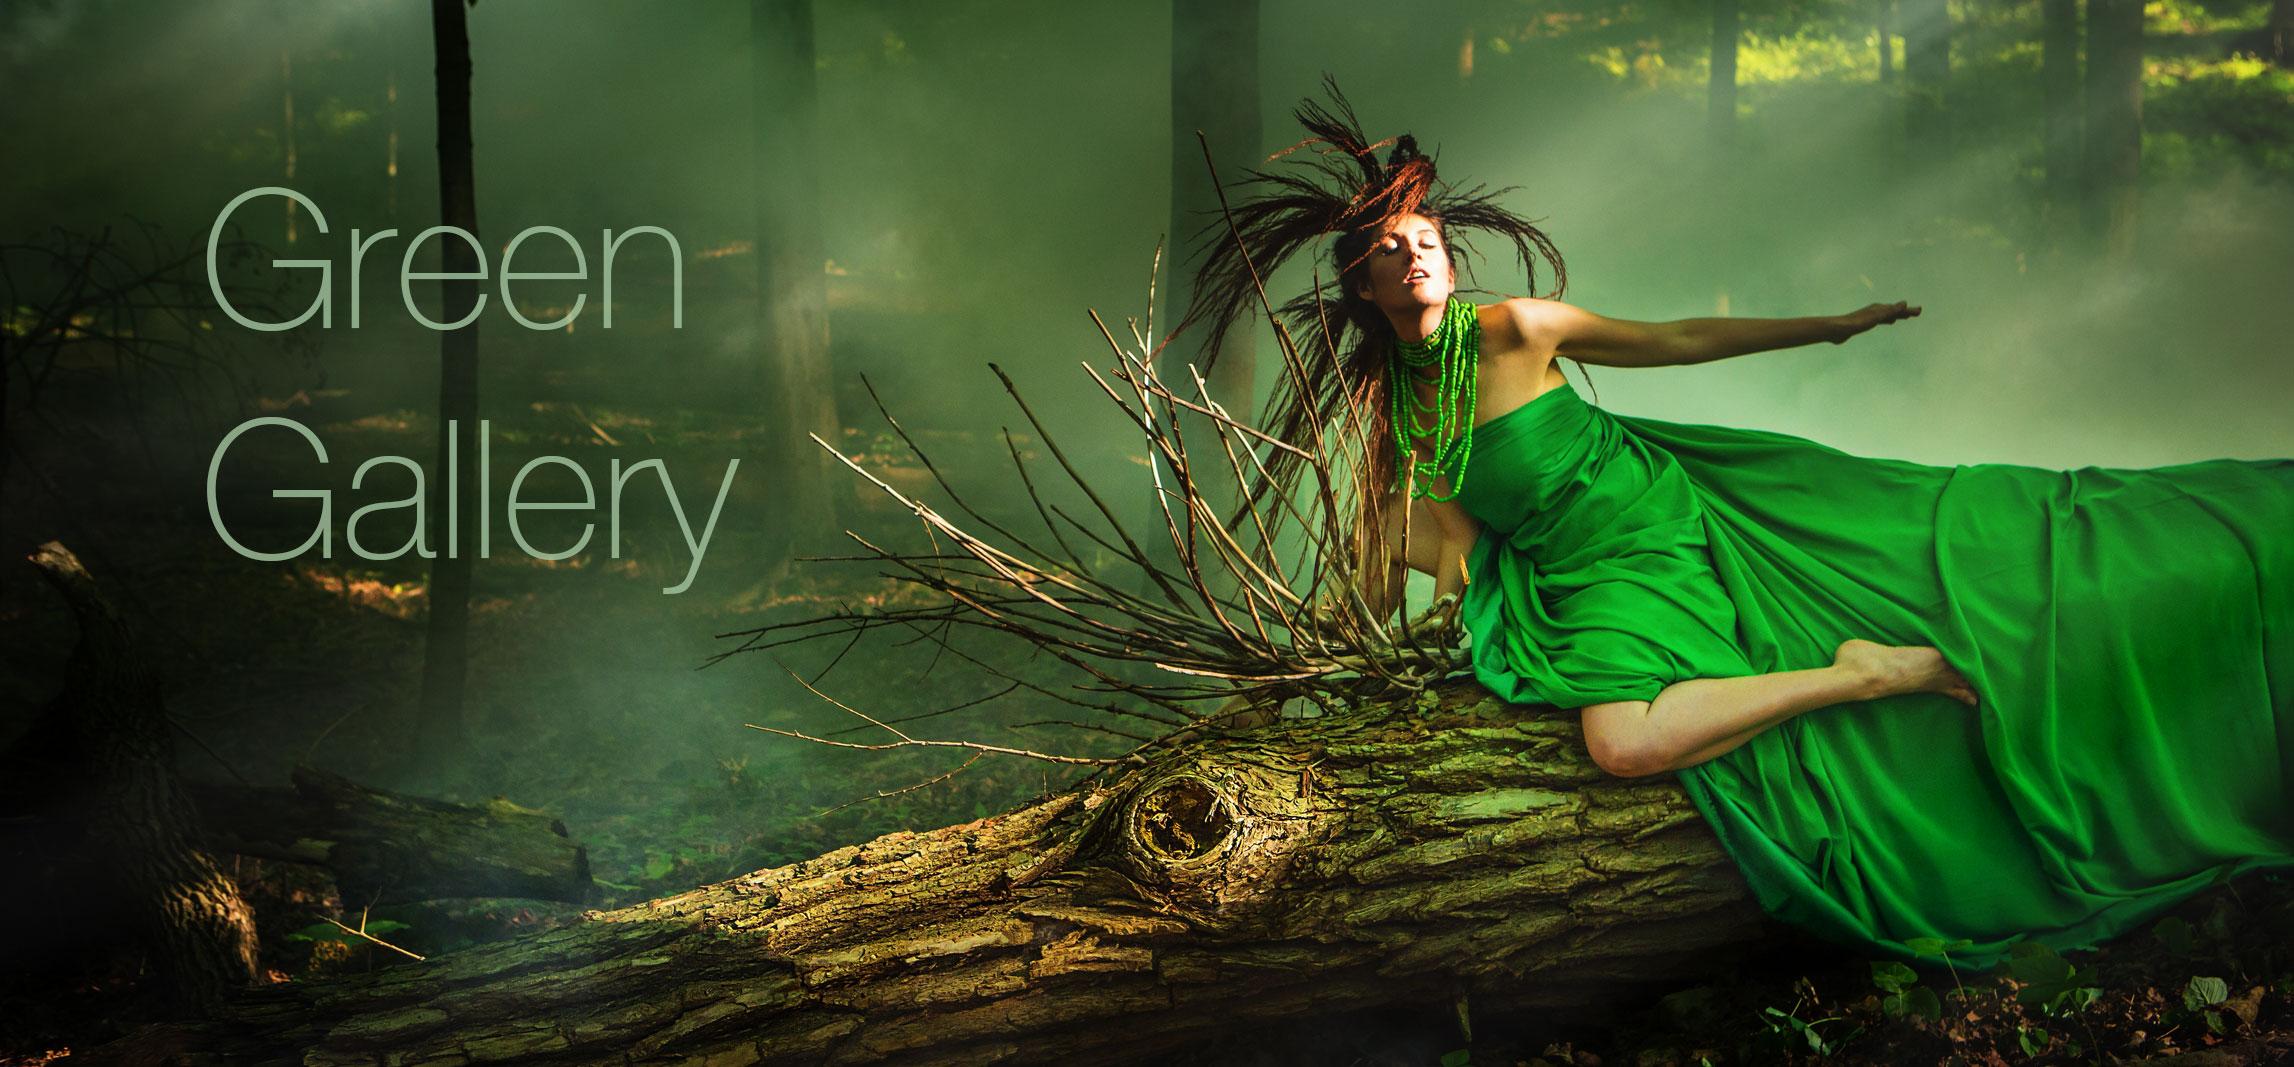 Laüra Hollick's Green Gallery